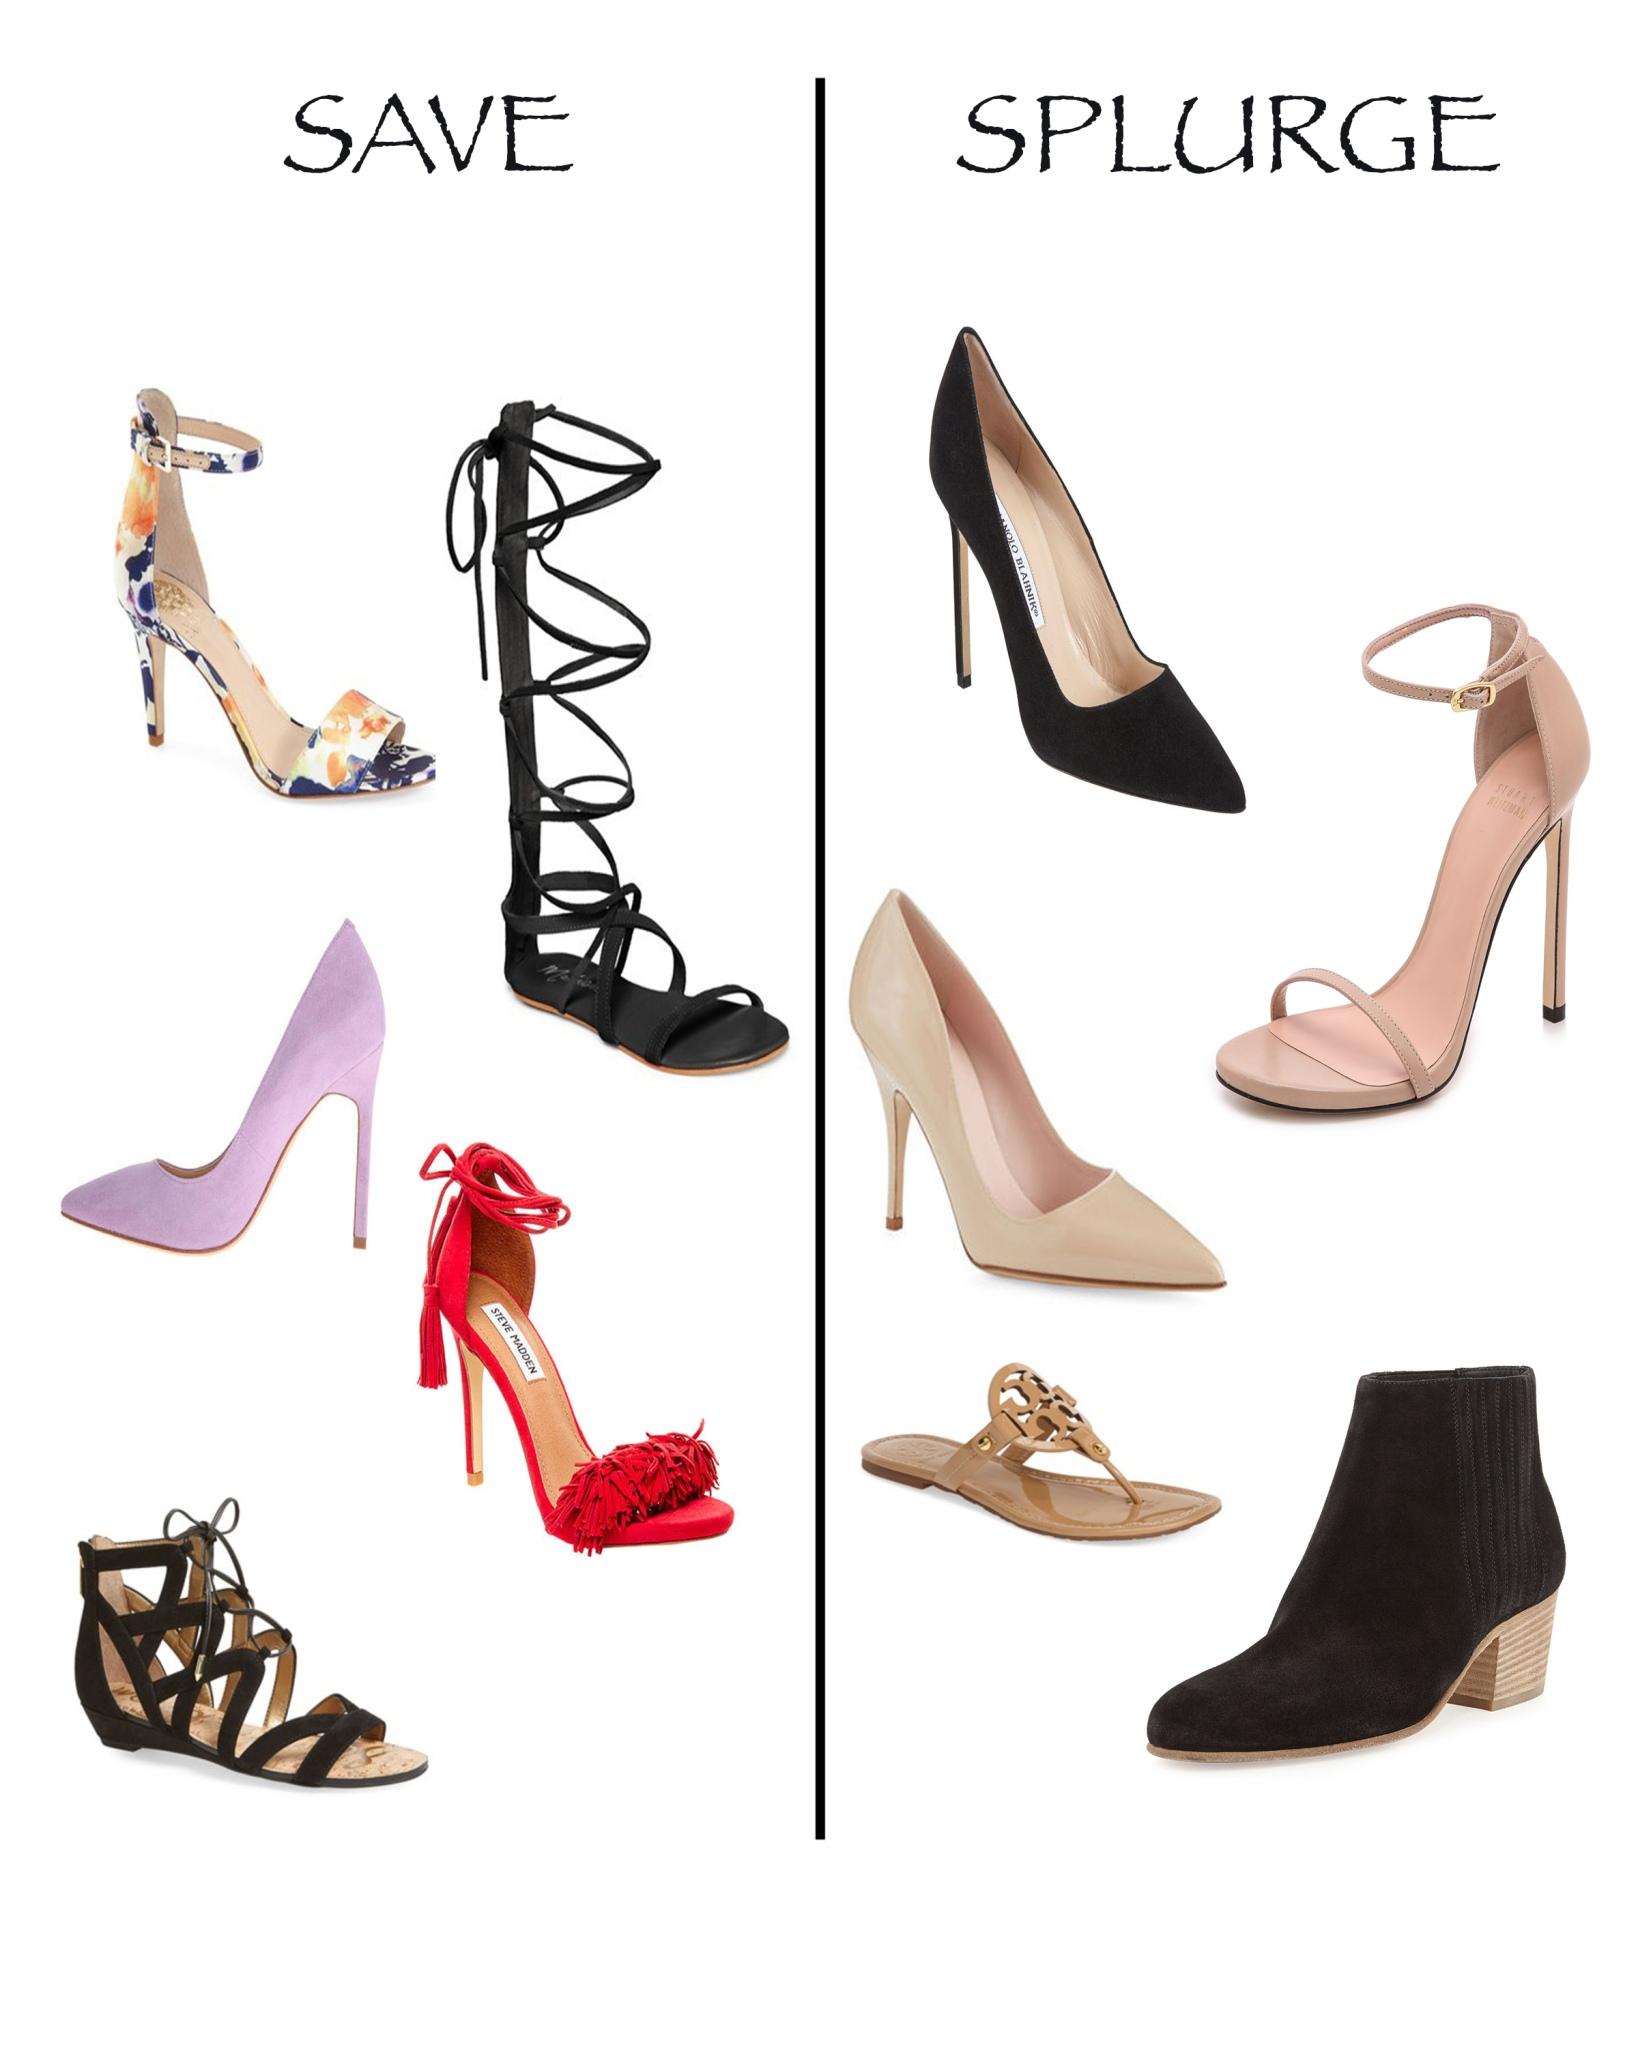 save slurge shoes